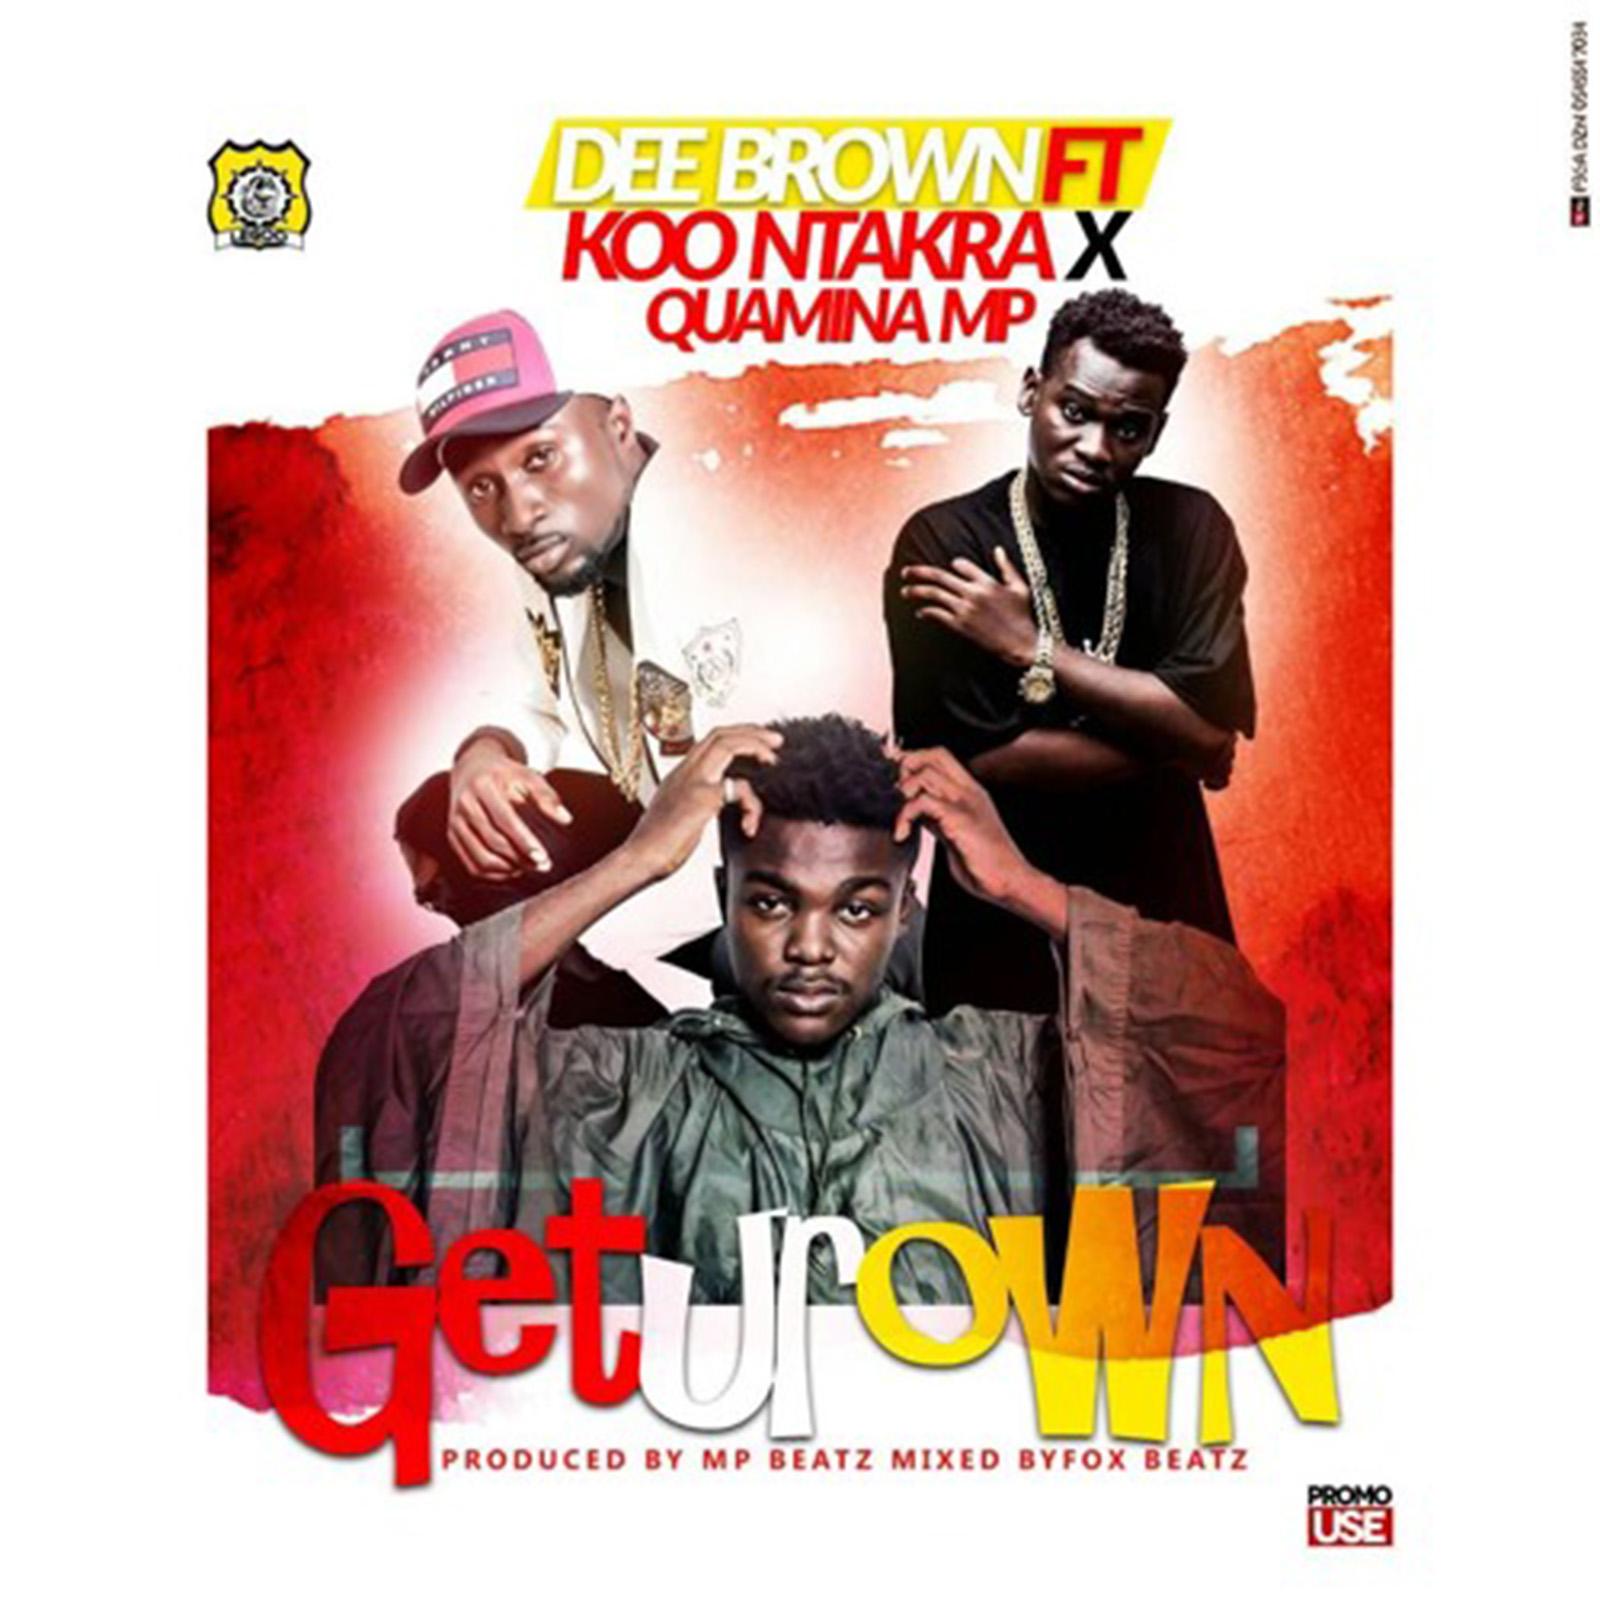 Get Ur Own by Dee Brown feat. Koo Ntakra & Quamina MP